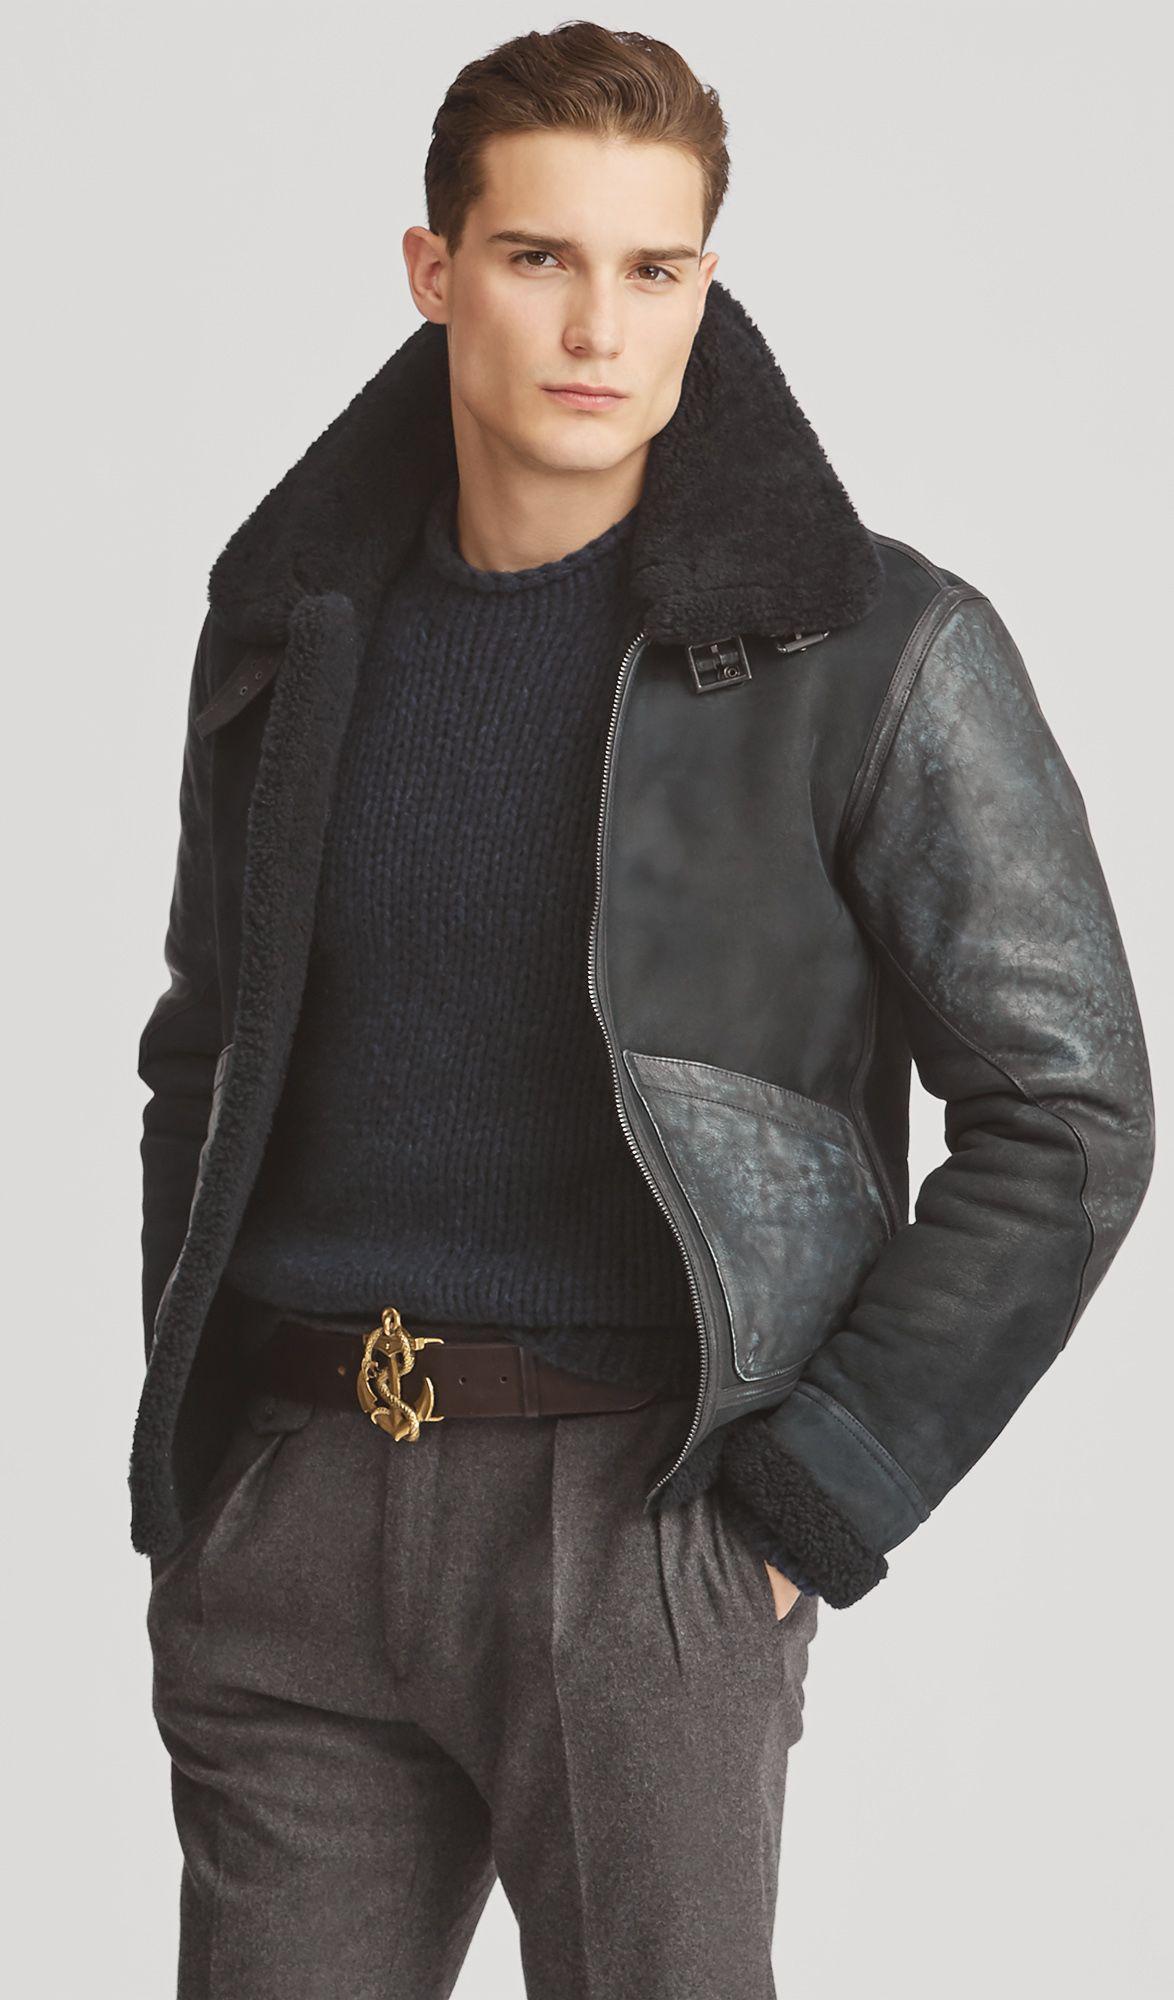 Ralph Lauren Purple Label Shearling Aviator Jacket Jackets Men Fashion Aviator Jackets Preppy Mens Fashion [ 2000 x 1174 Pixel ]